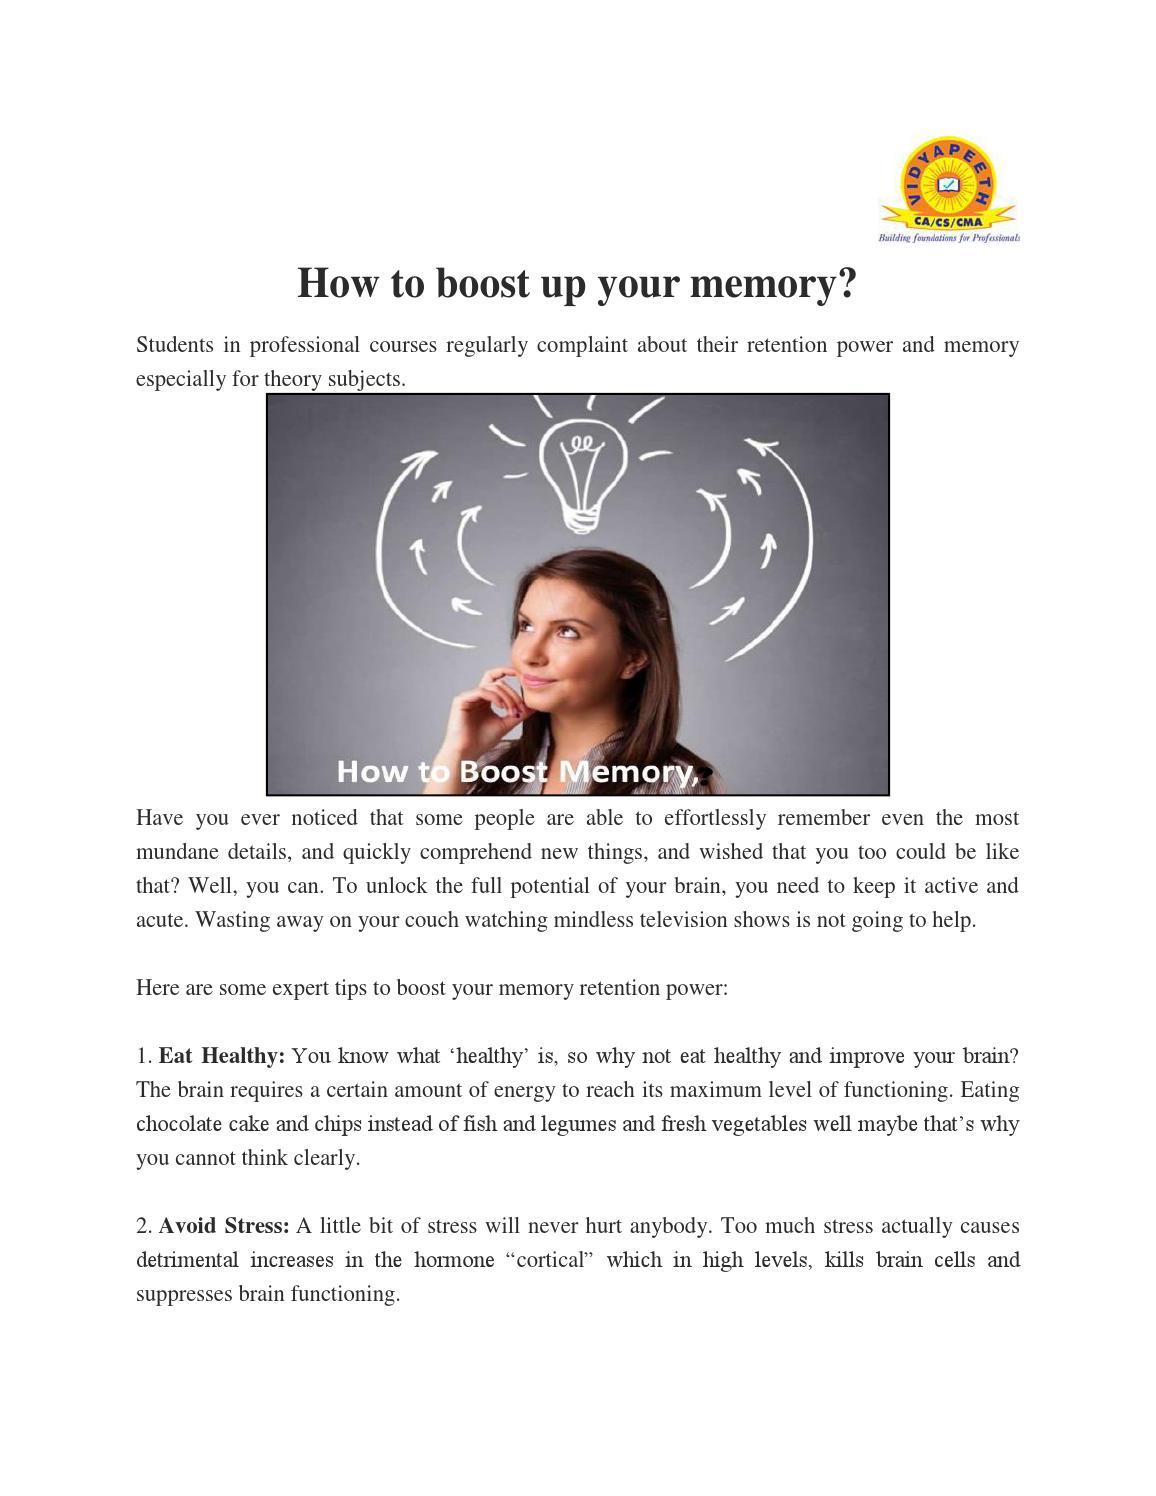 Memory boosting foods dr oz image 3